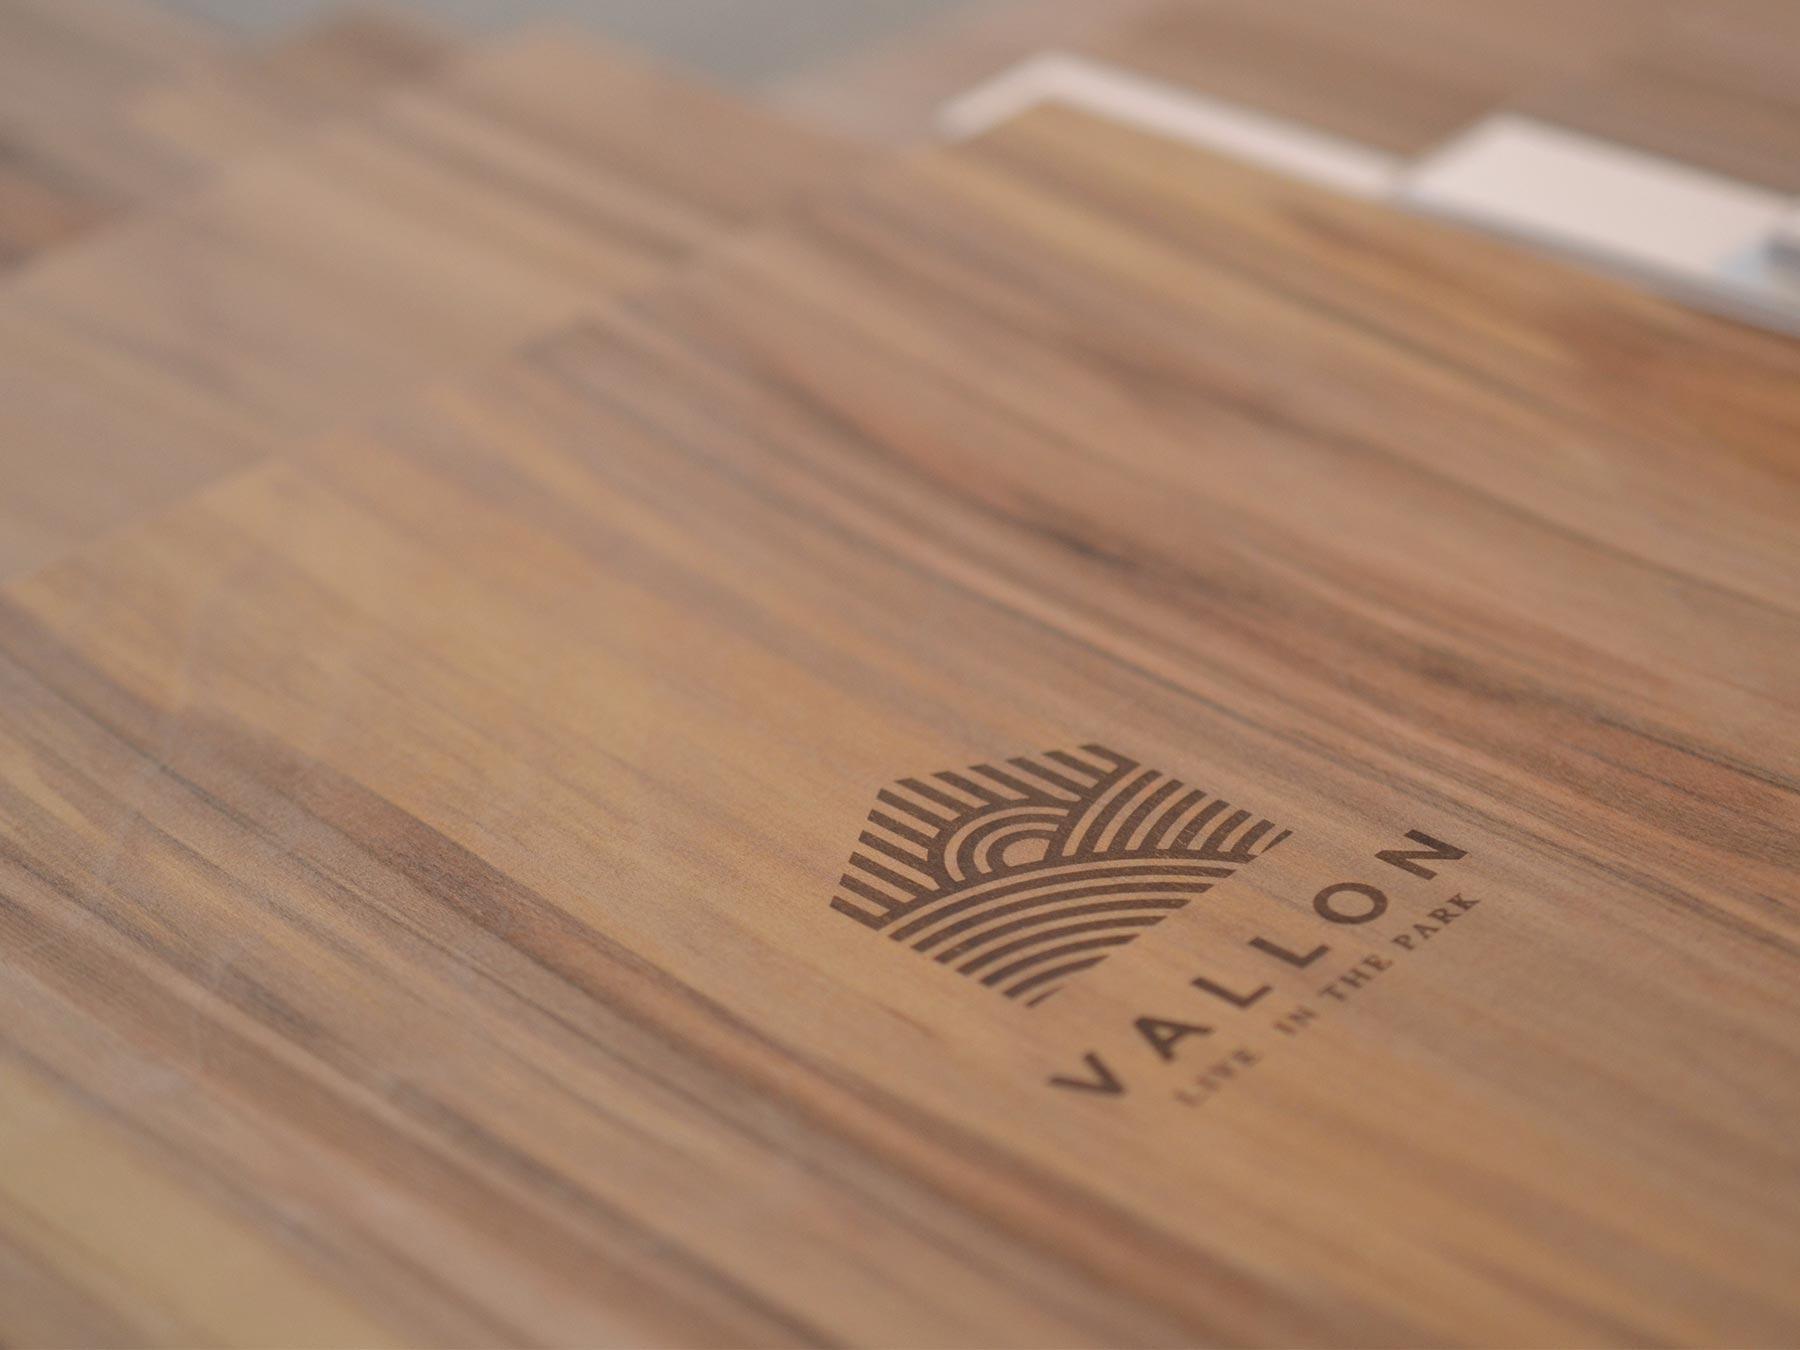 vallon logo wood burn